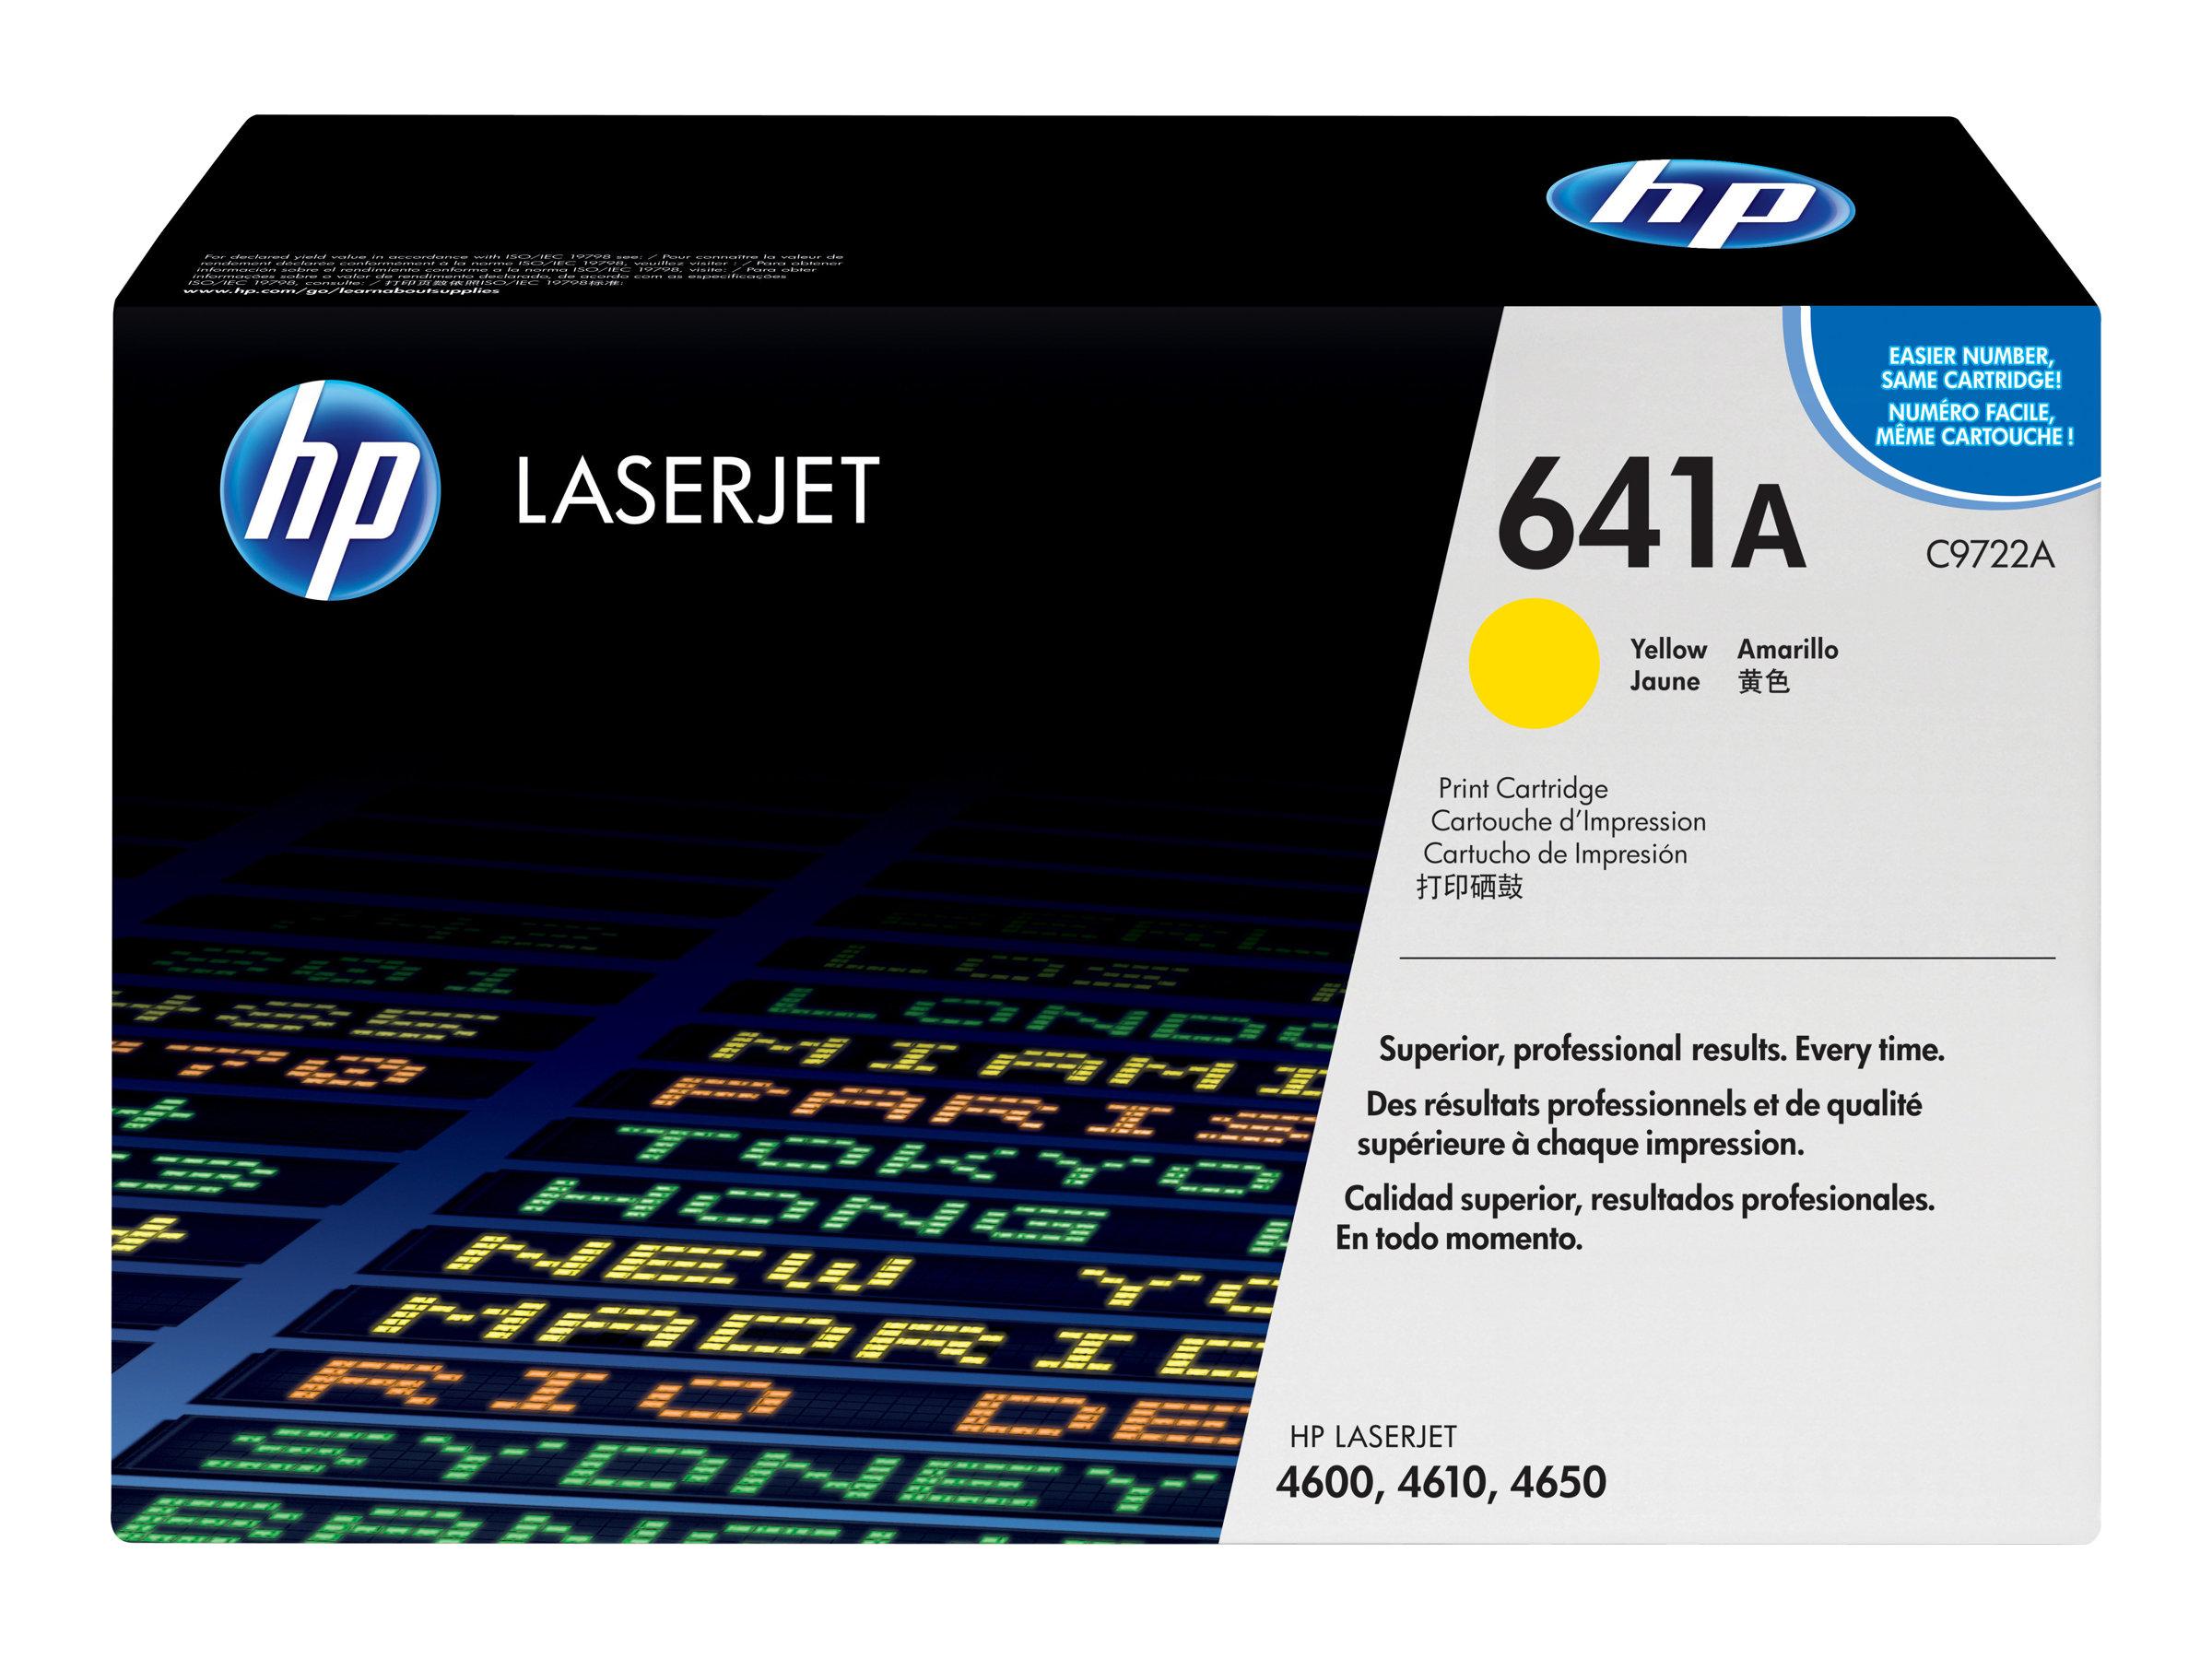 HP 641A - Gelb - Original - LaserJet - Tonerpatrone (C9722A) - für Color LaserJet 4600, 4610, 4650